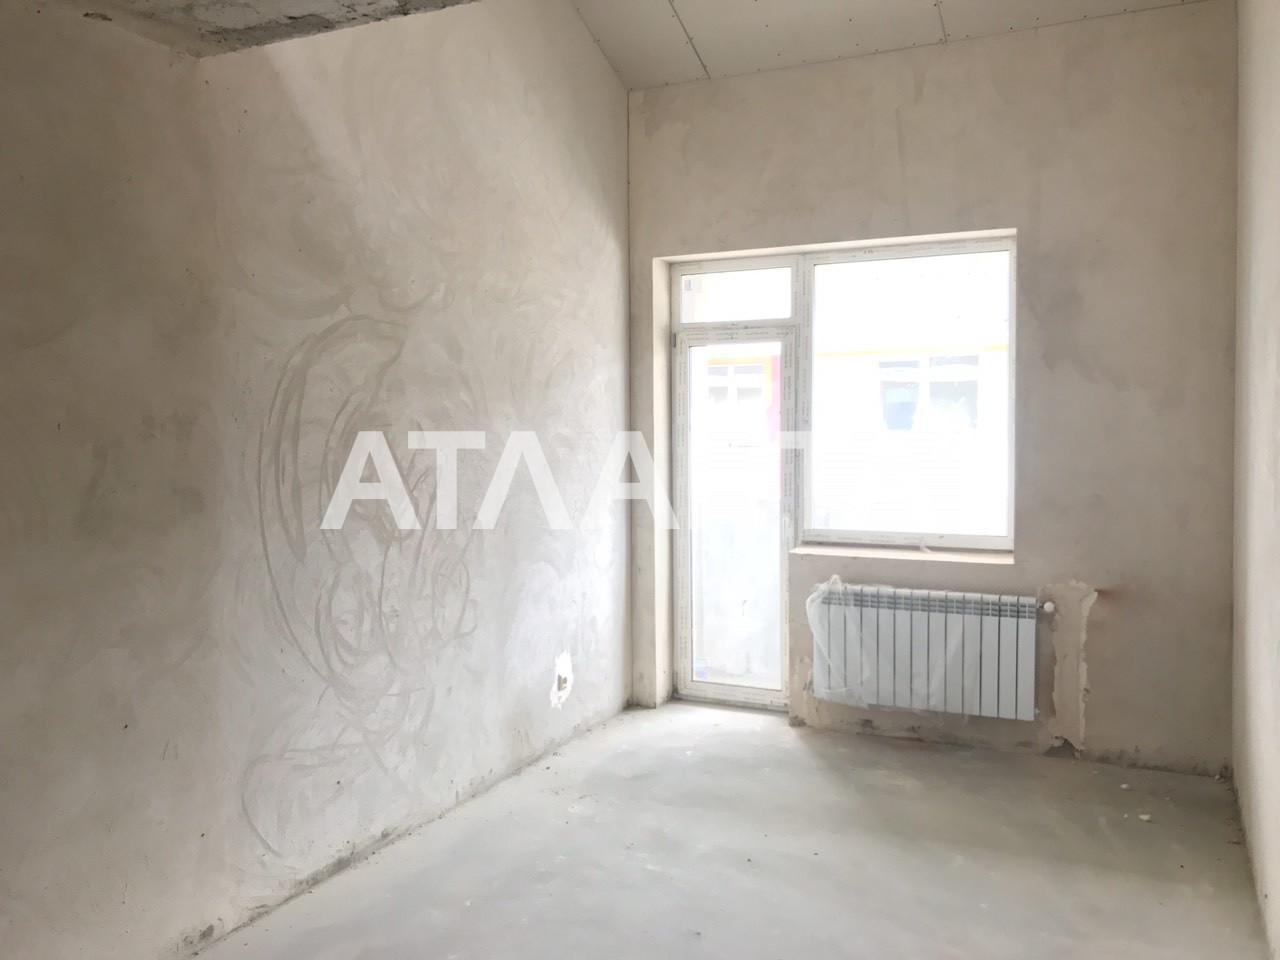 Продается Многоуровневая Квартира на ул. Валовня — 38 000 у.е. (фото №7)